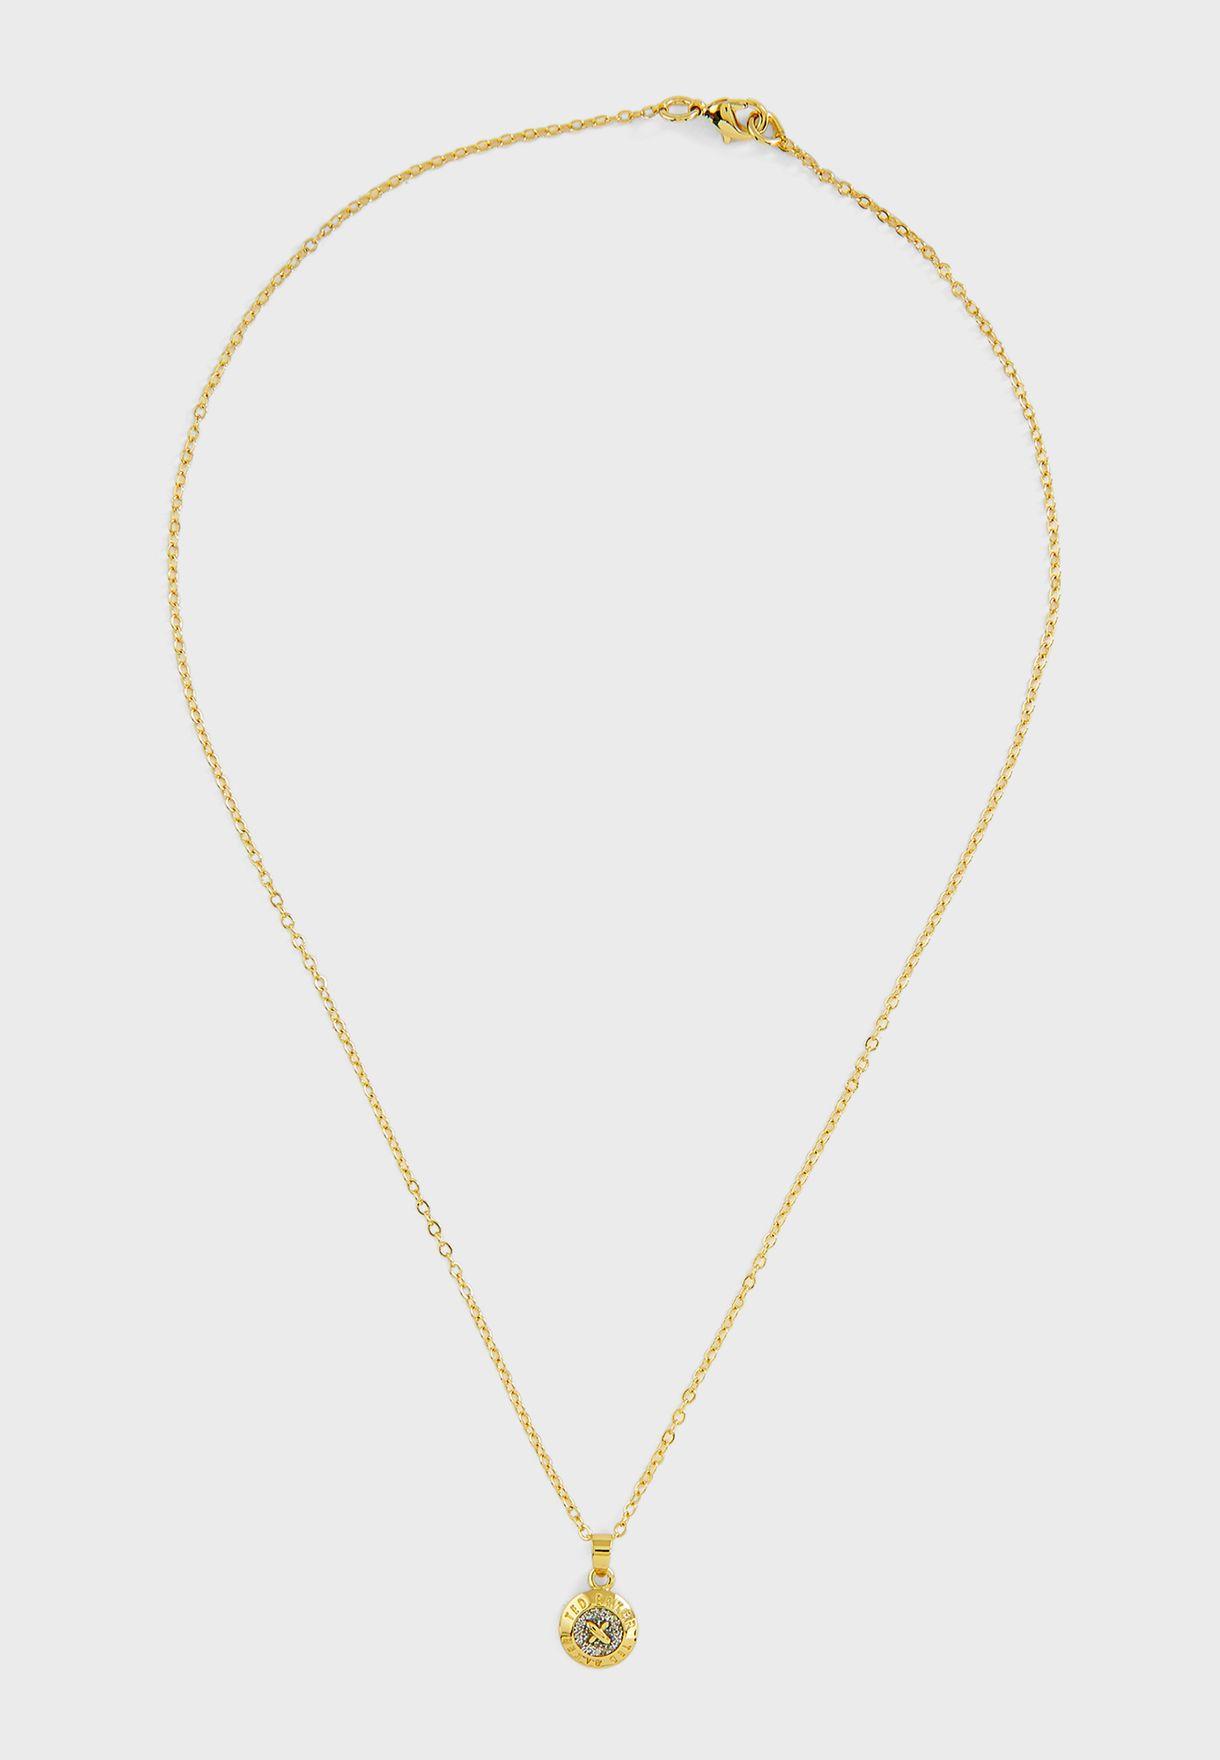 Emillia Mini Button Necklace + Earrings Gift Set